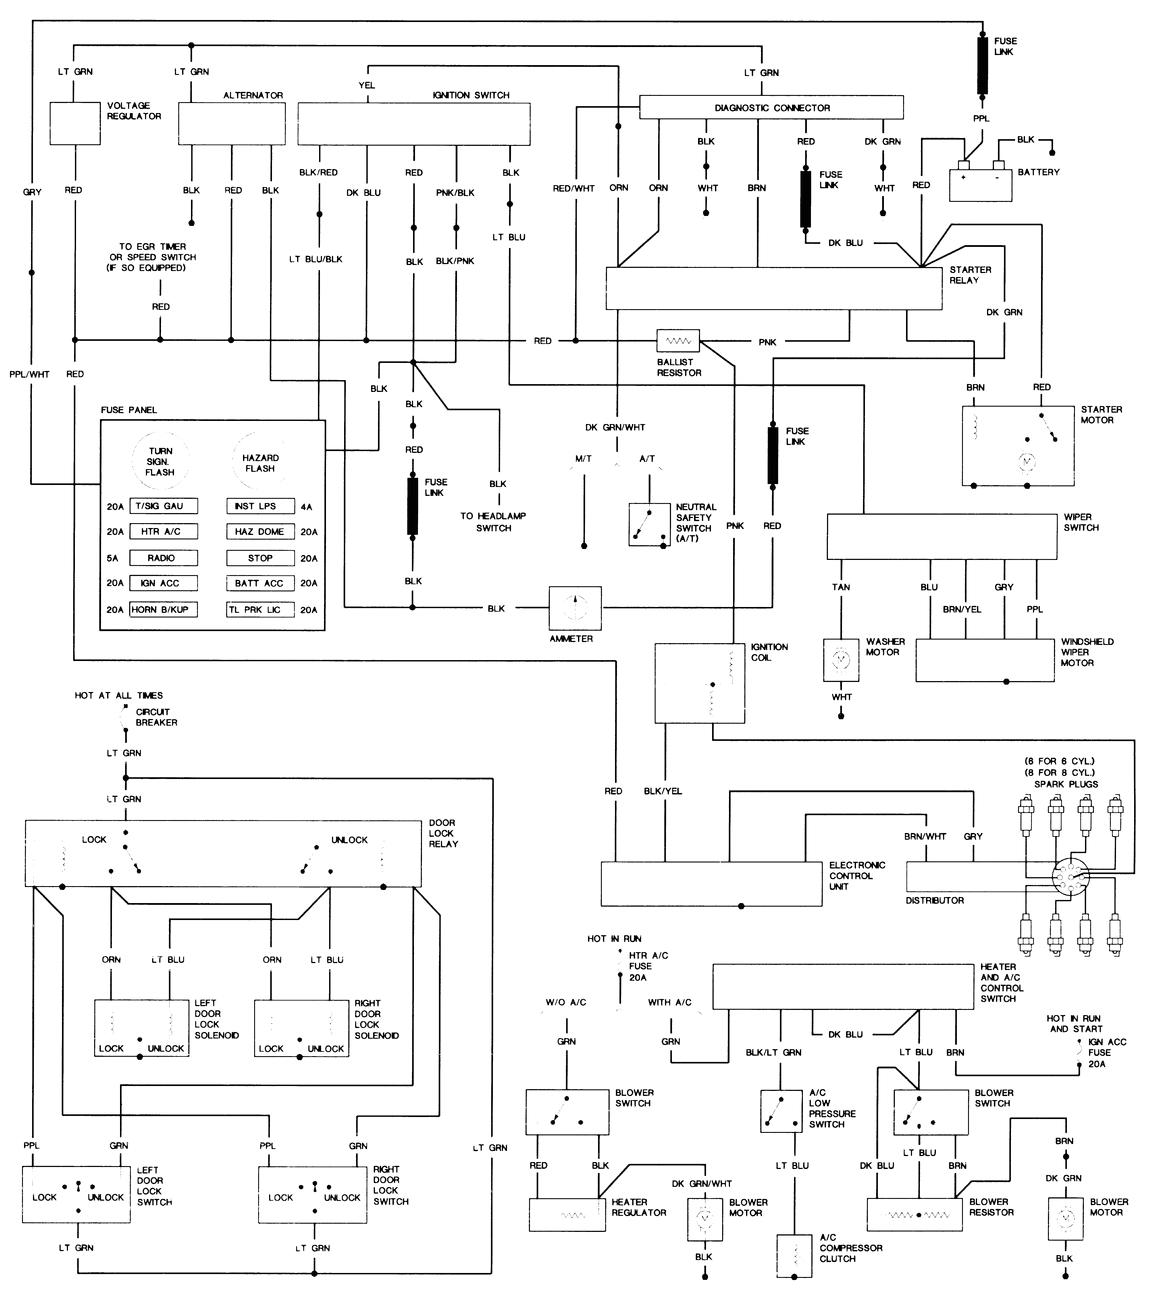 1940 dodge truck wiring diagram wiring diagram database 1940 dodge wiring diagram